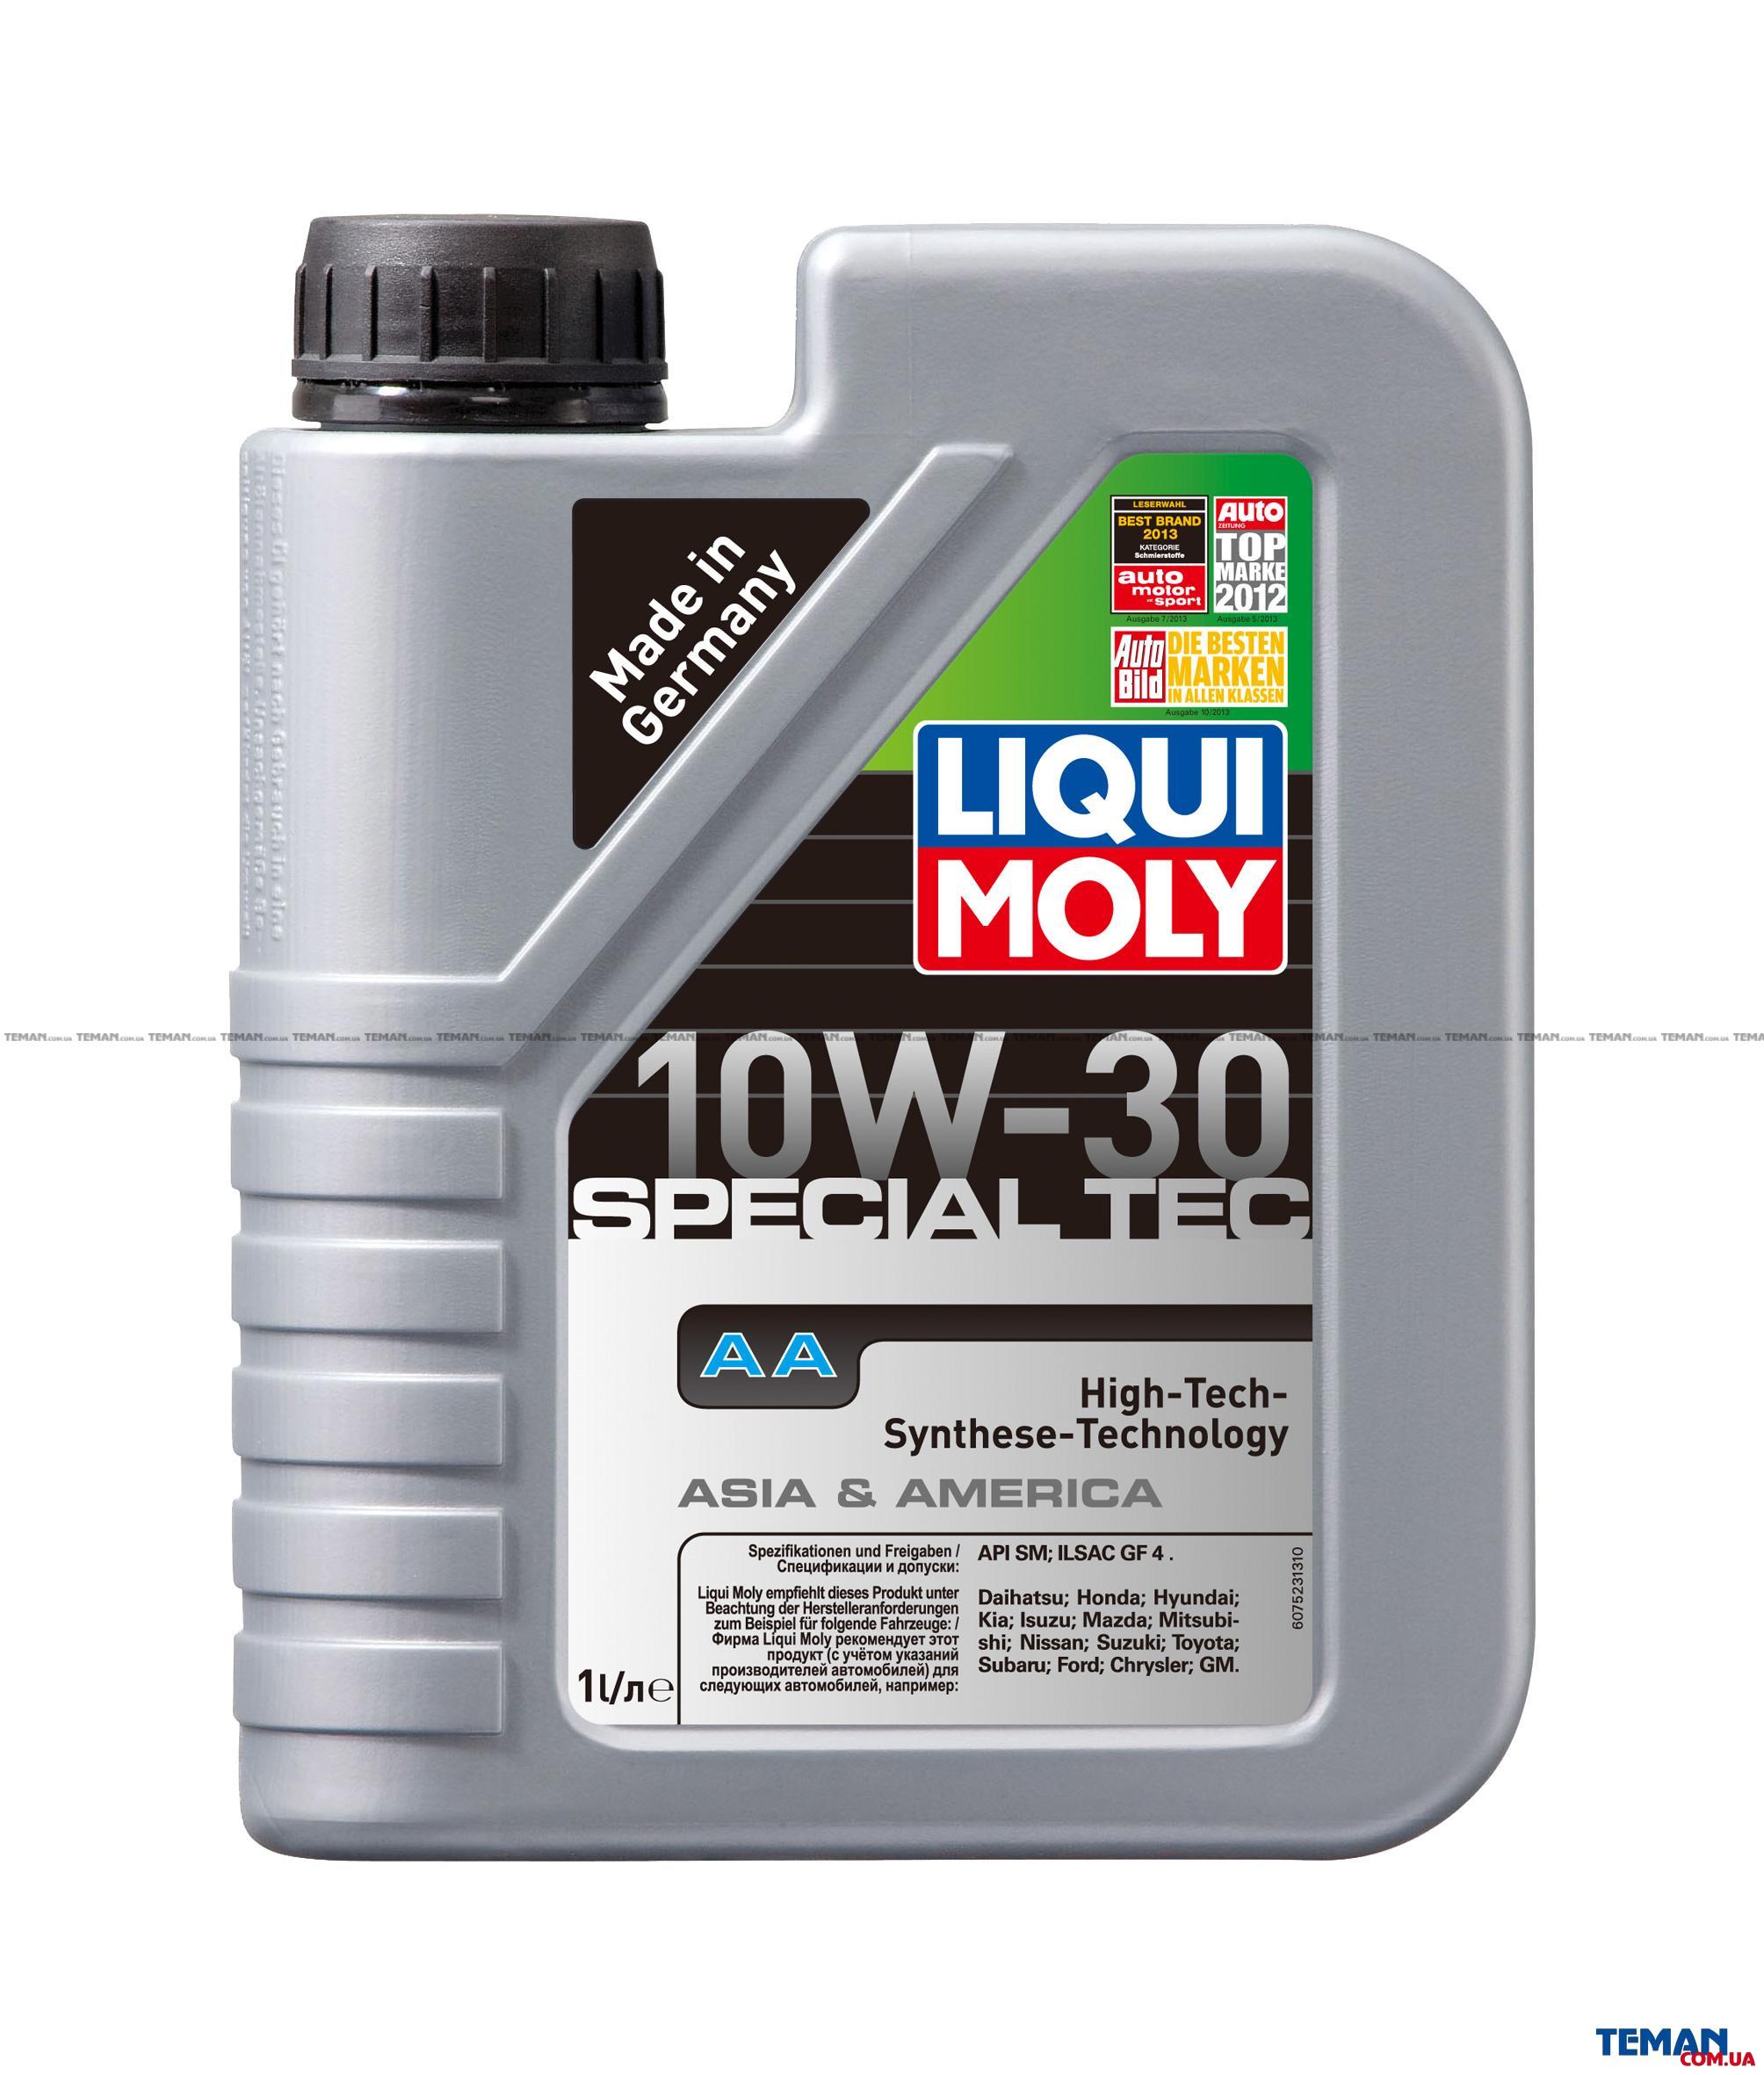 НС-синтетическое моторное масло Special Tec AA 10W-30